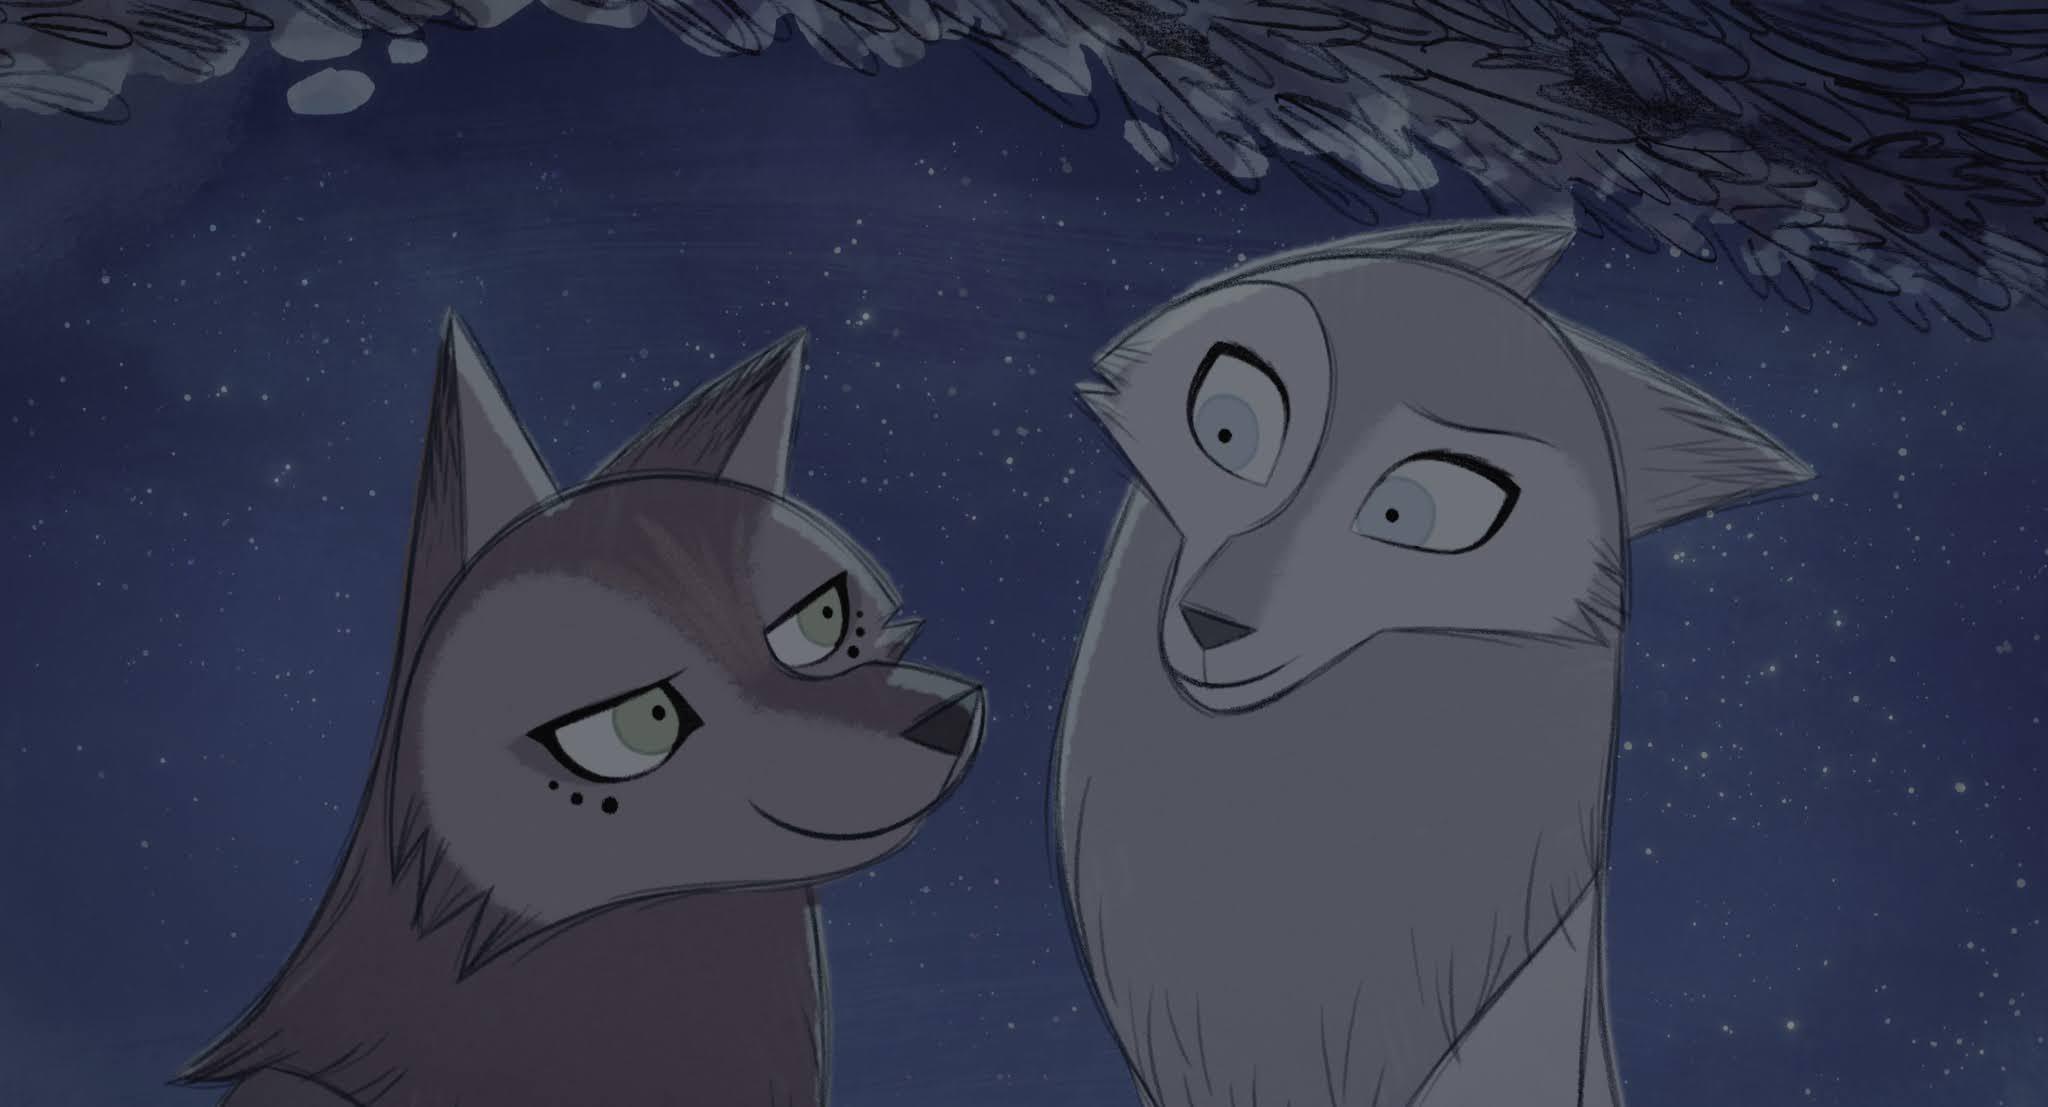 Wolfwalkers: Espíritu de lobo (2020) 4k WEB-DL HDR Latino